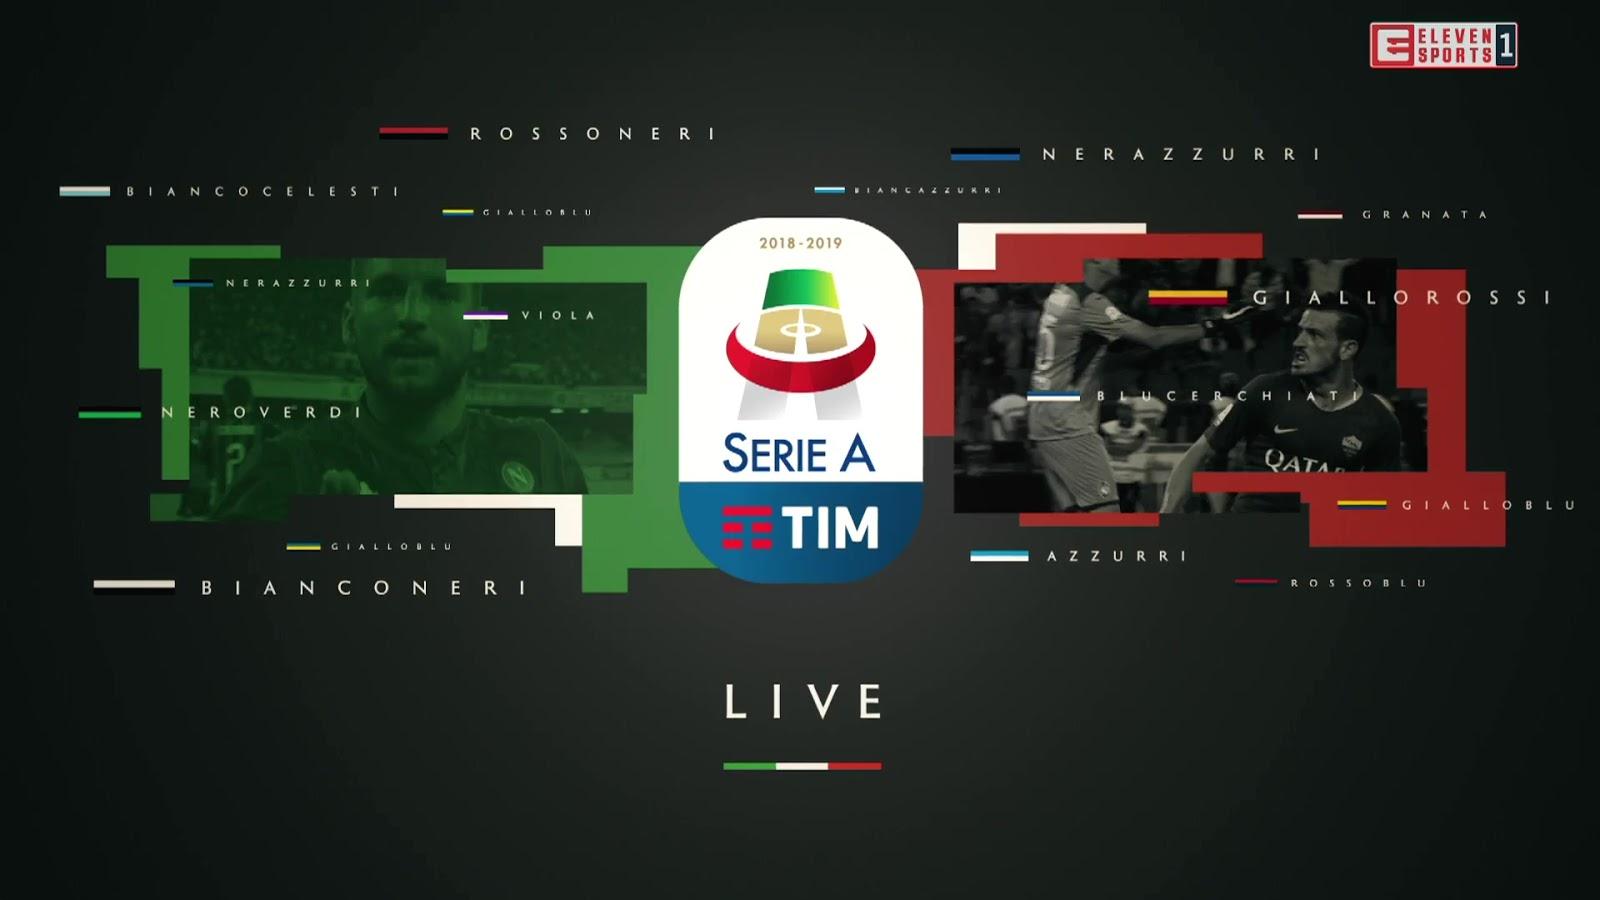 Serie A 18/19 - Matchday 7 - Juventus vs Napoli - 29/09/2018